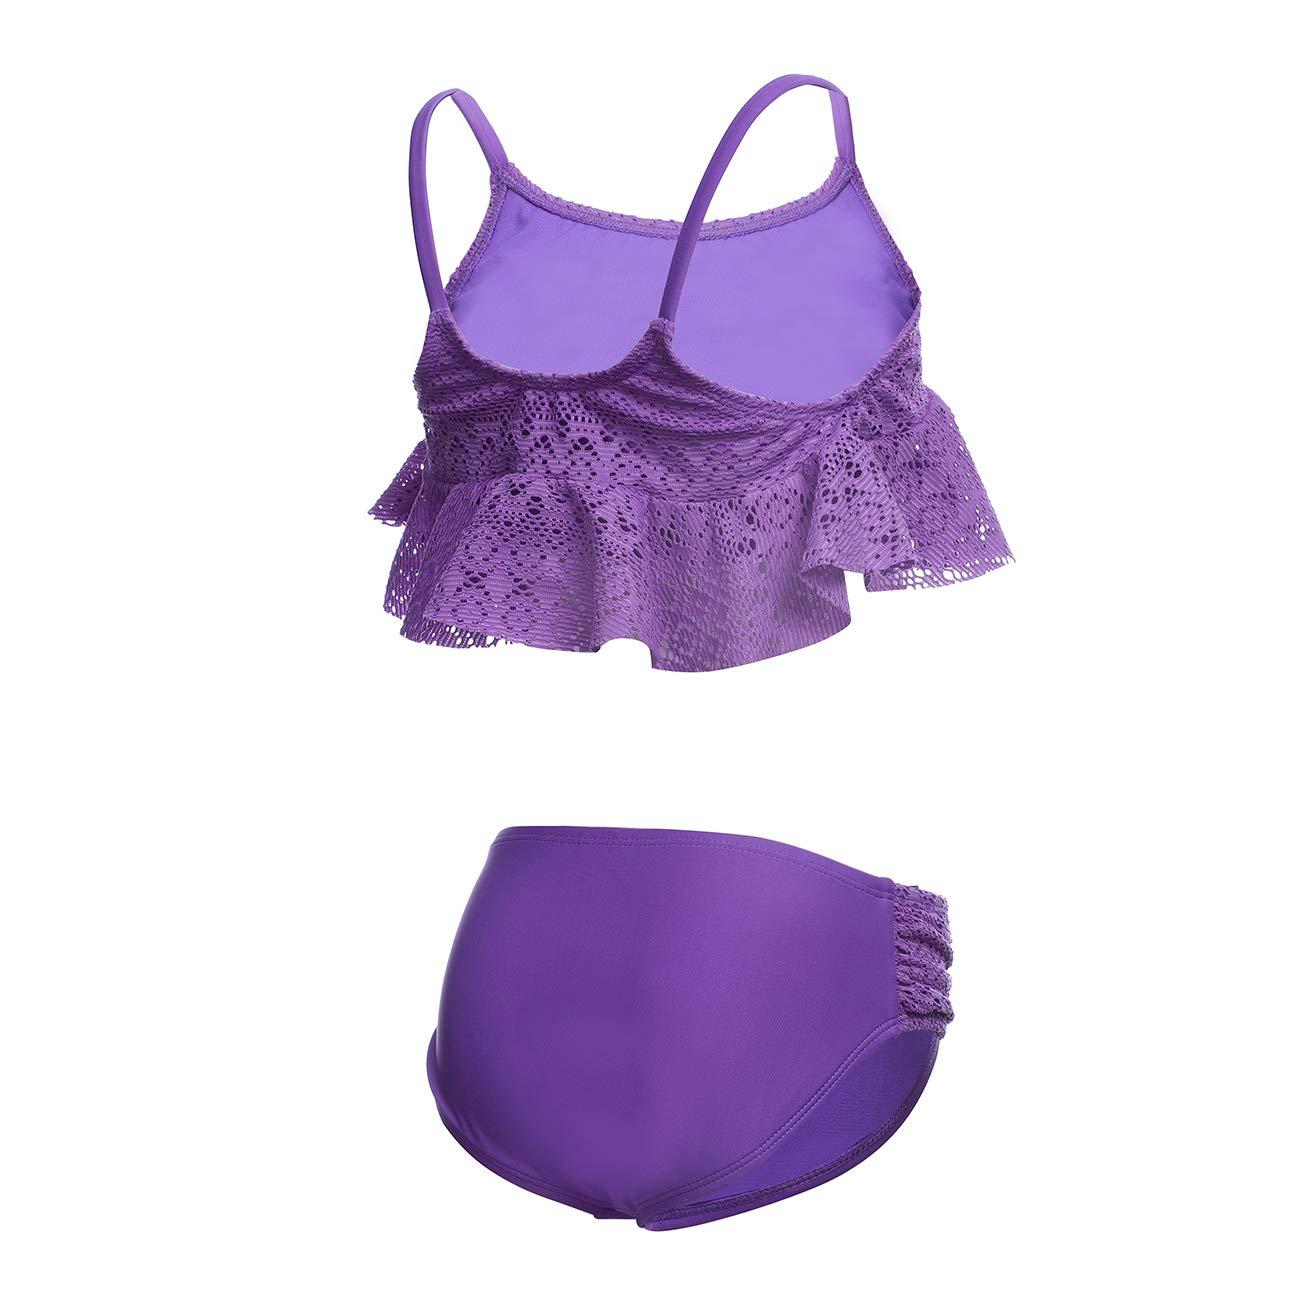 DAYU Girls Fashionable Bikini Set Beach 2 Piece Swimsuit Bathing Suit